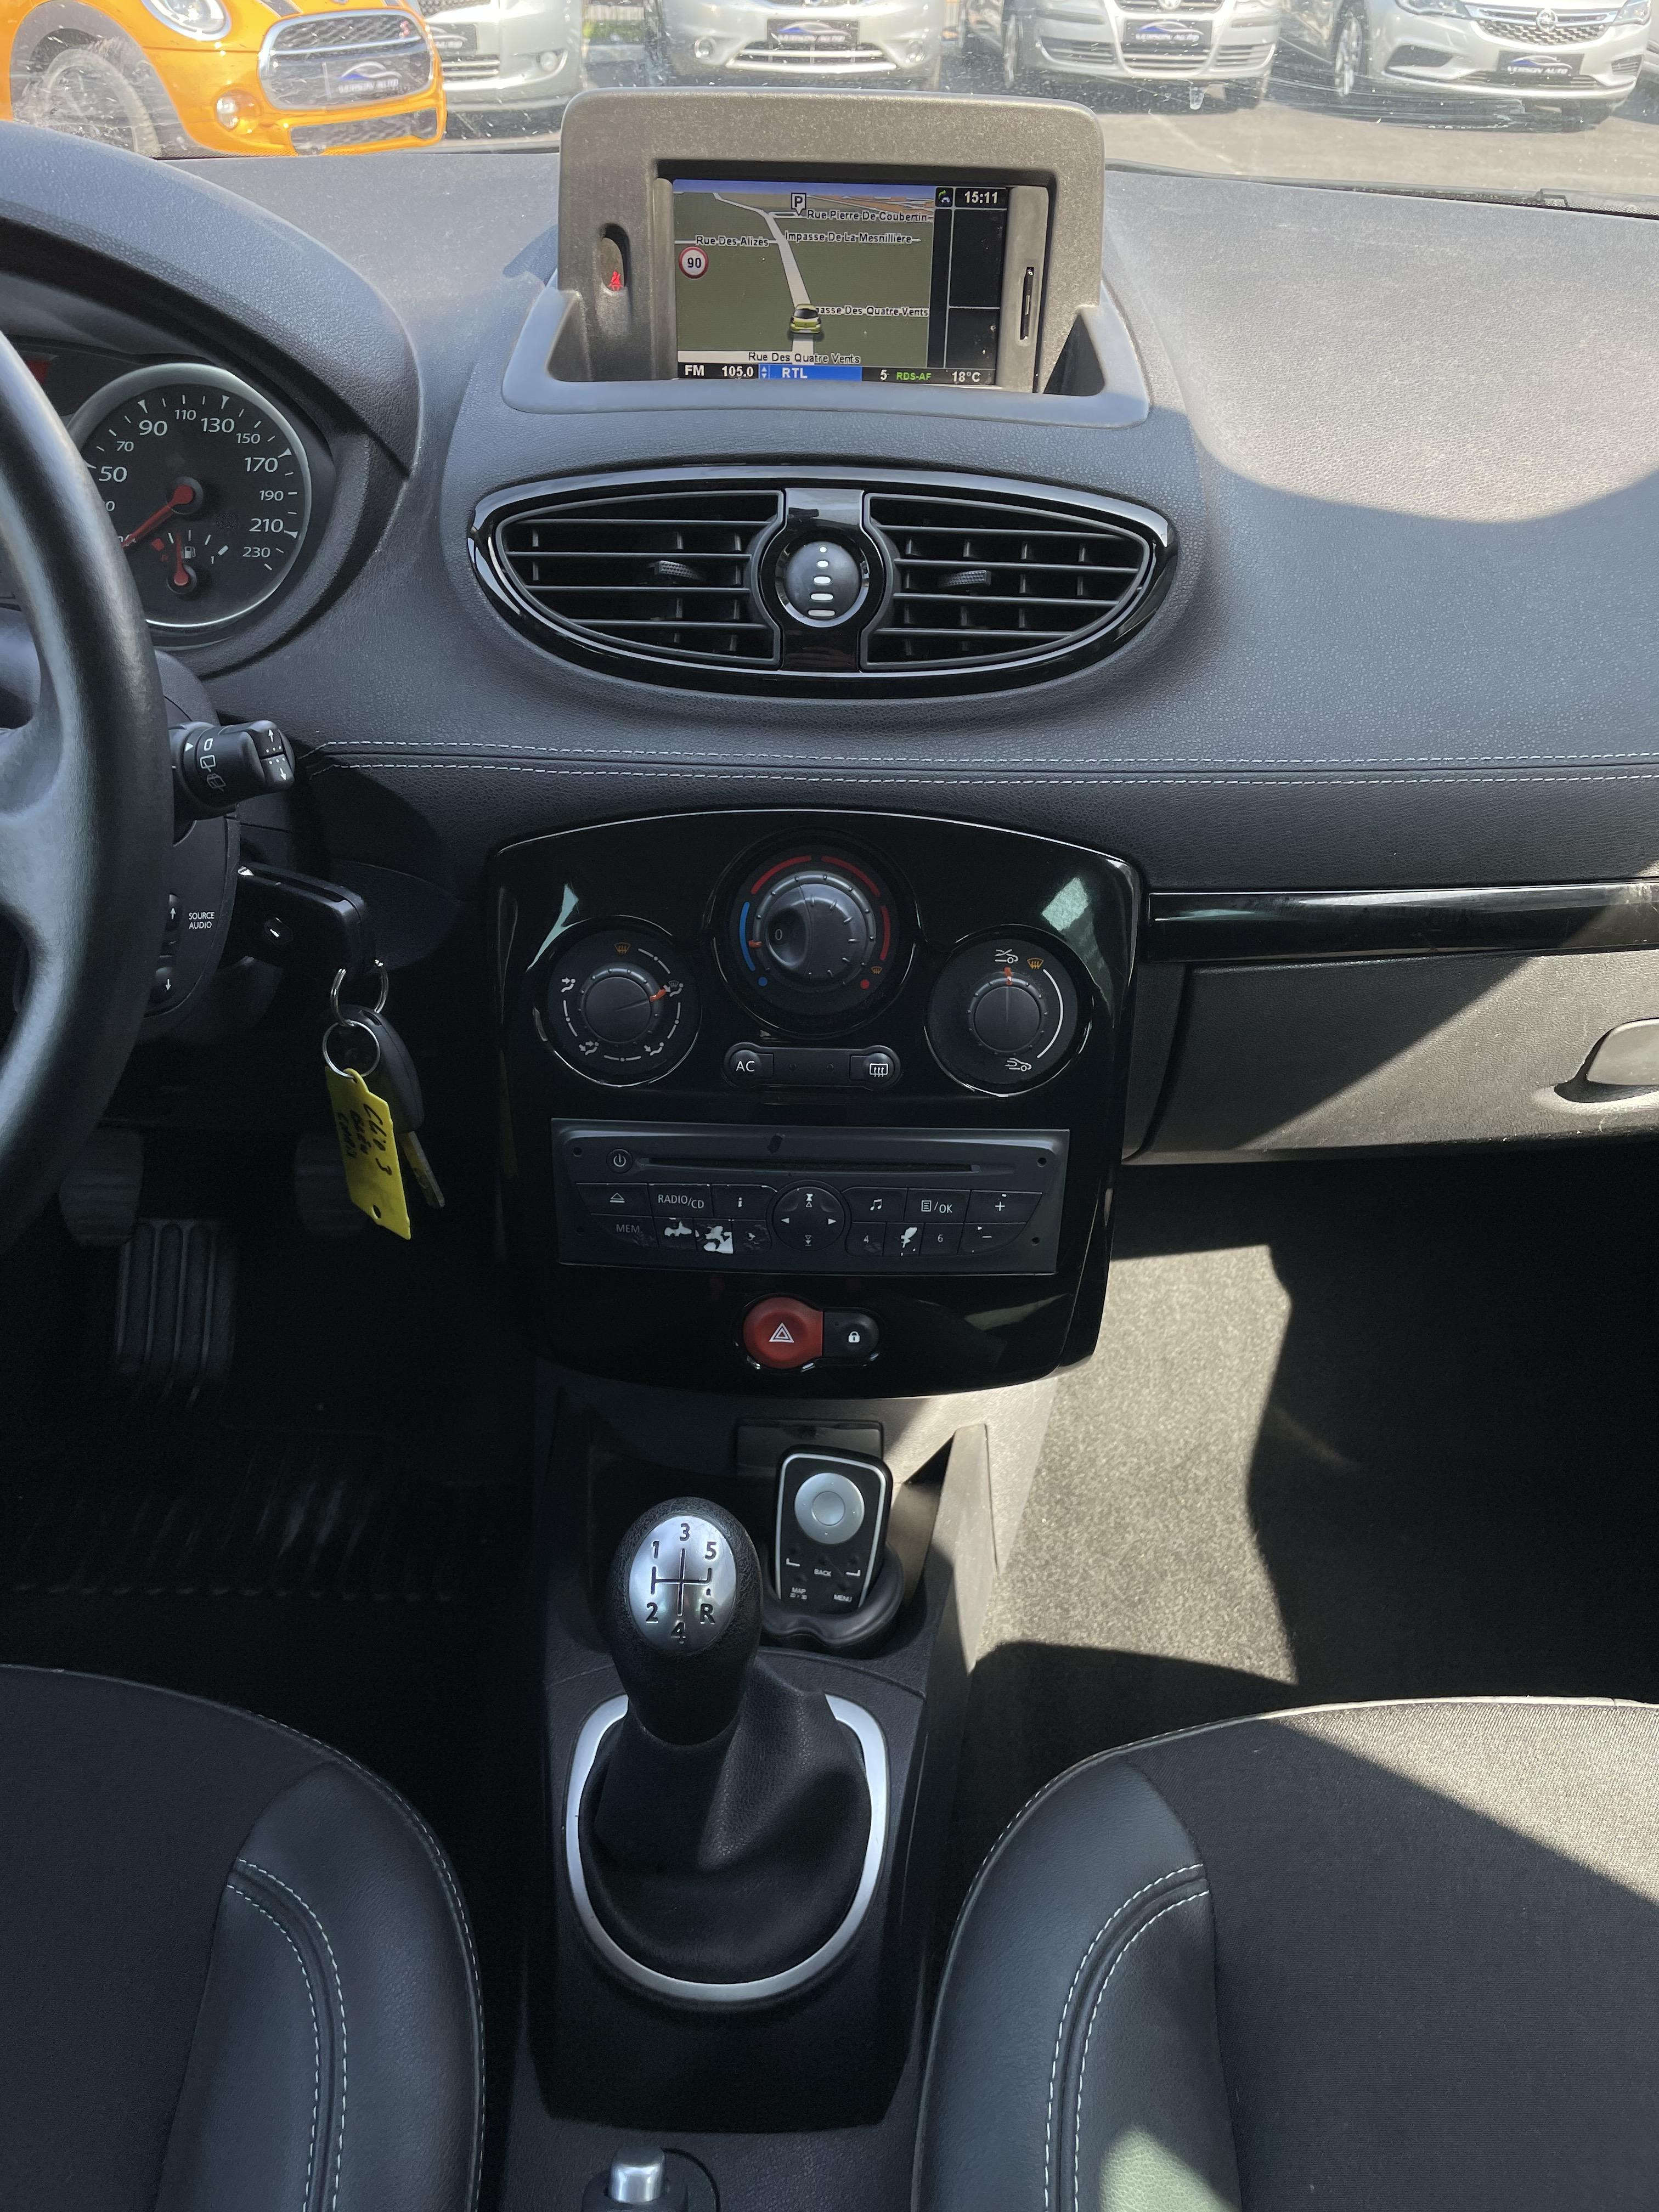 Clio III 1 5 dCi 75 GPS TEL CLIM REGUL 130 000 KMS